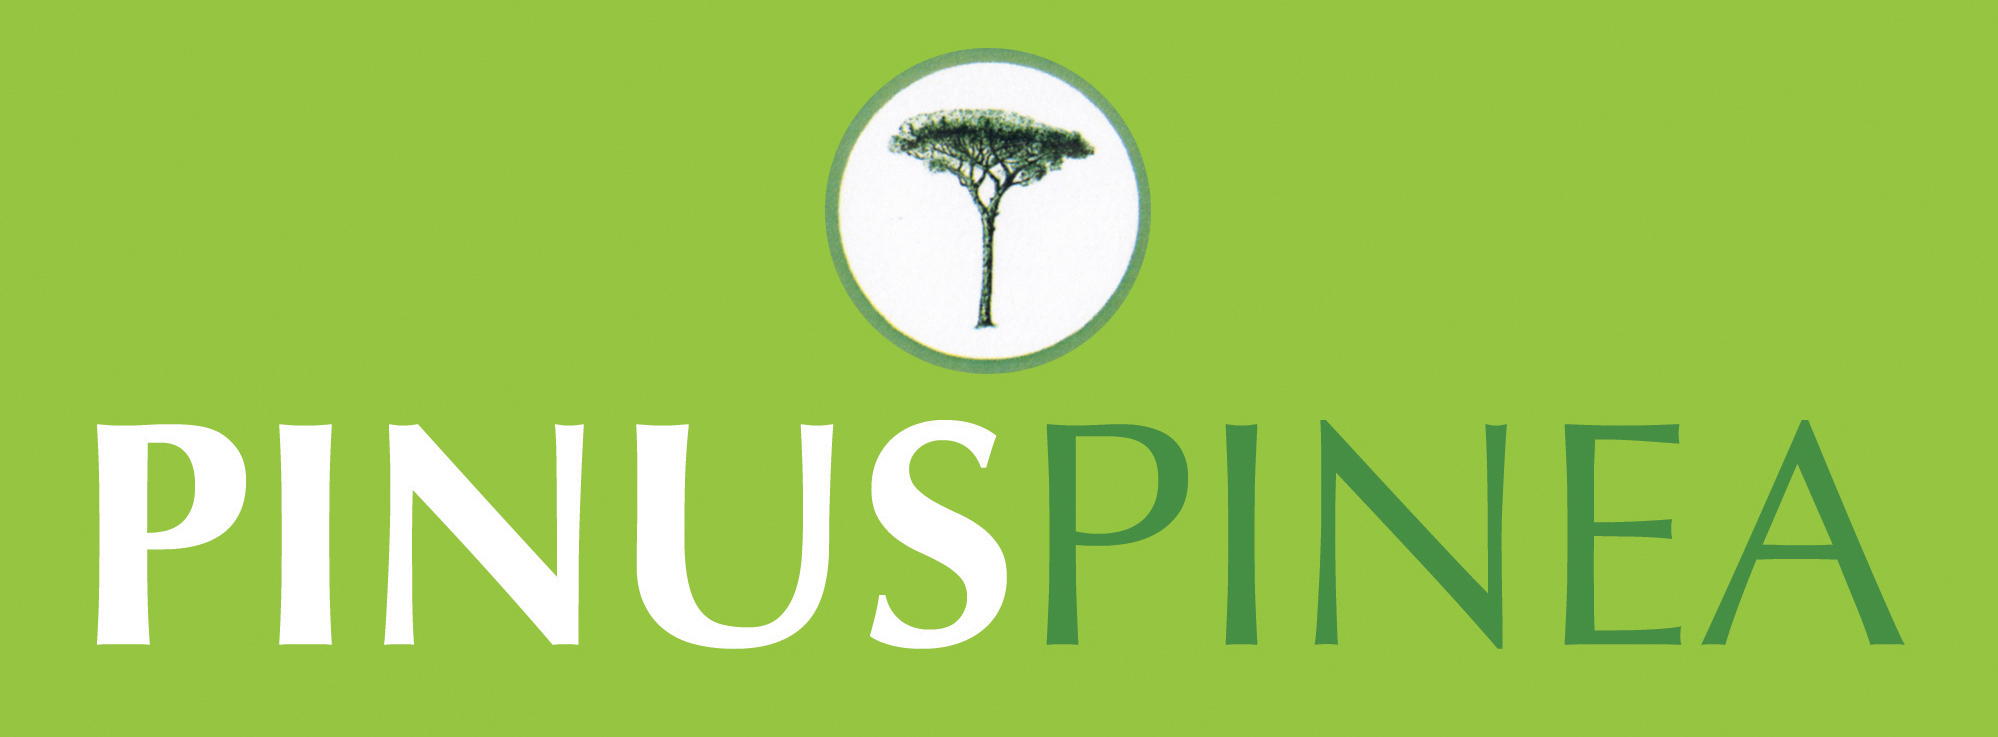 logo2-pinus-pinea